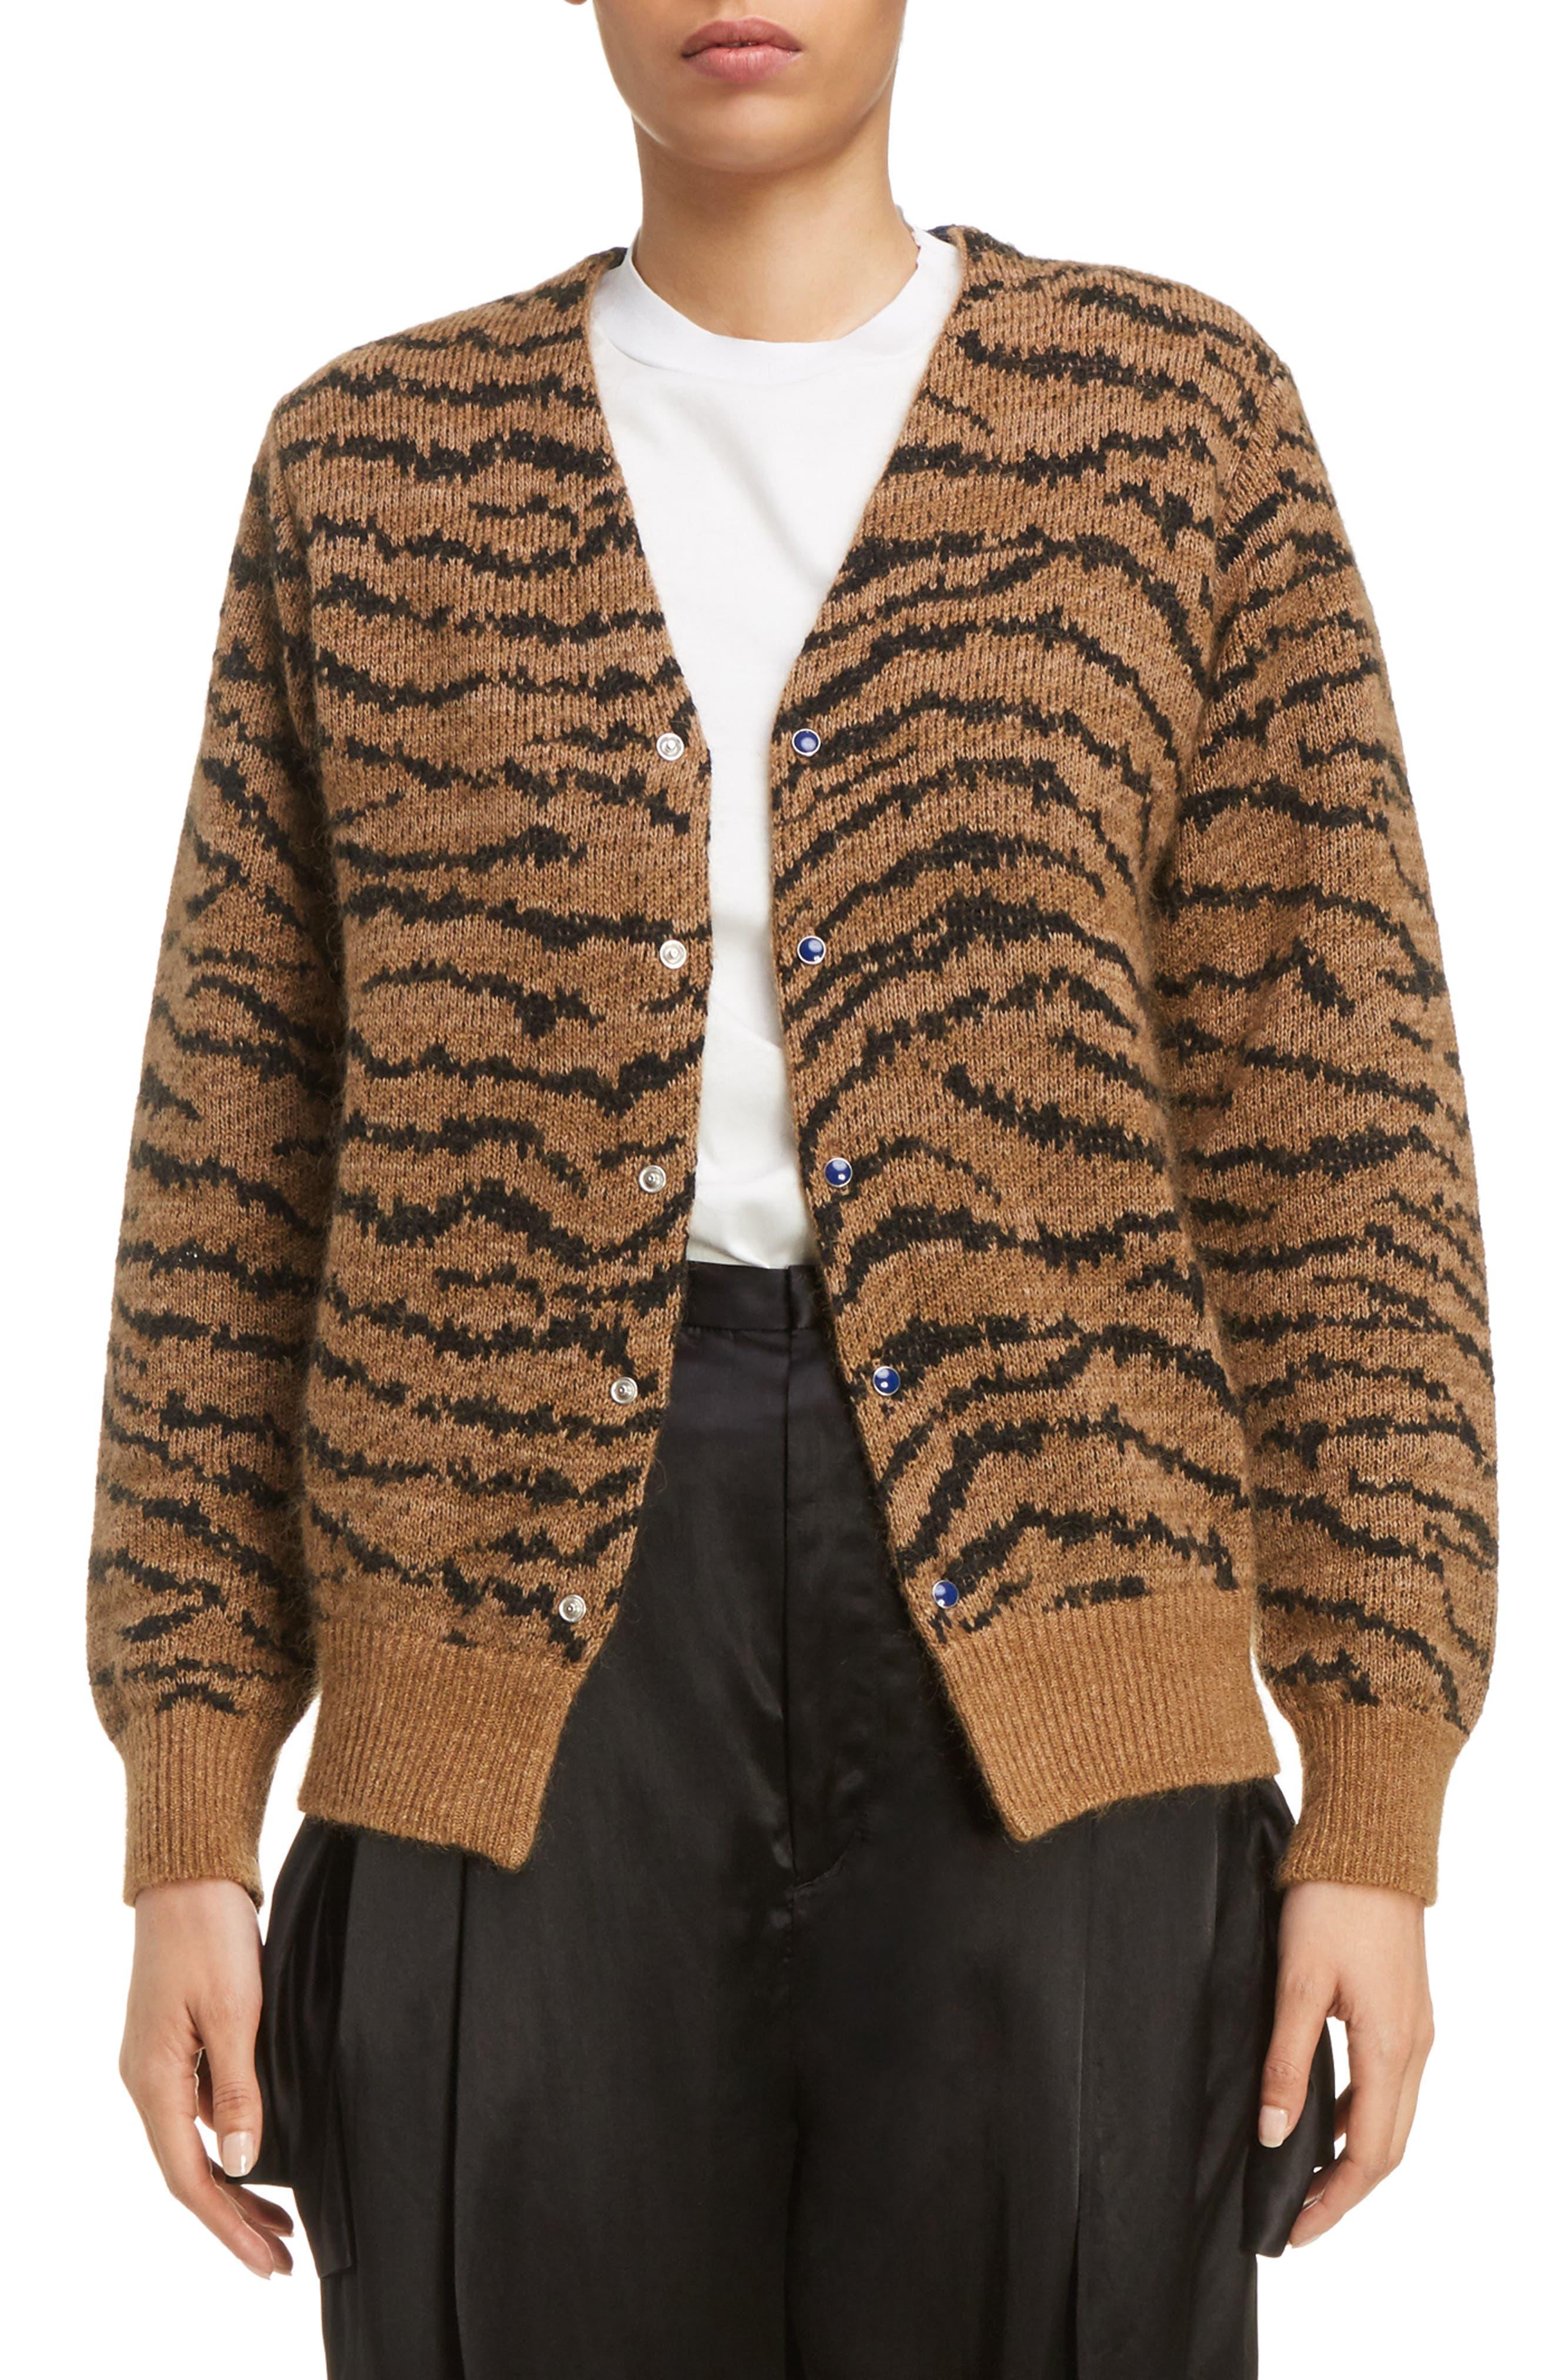 Tiger Jacquard Knit Button Cardigan,                         Main,                         color, 250